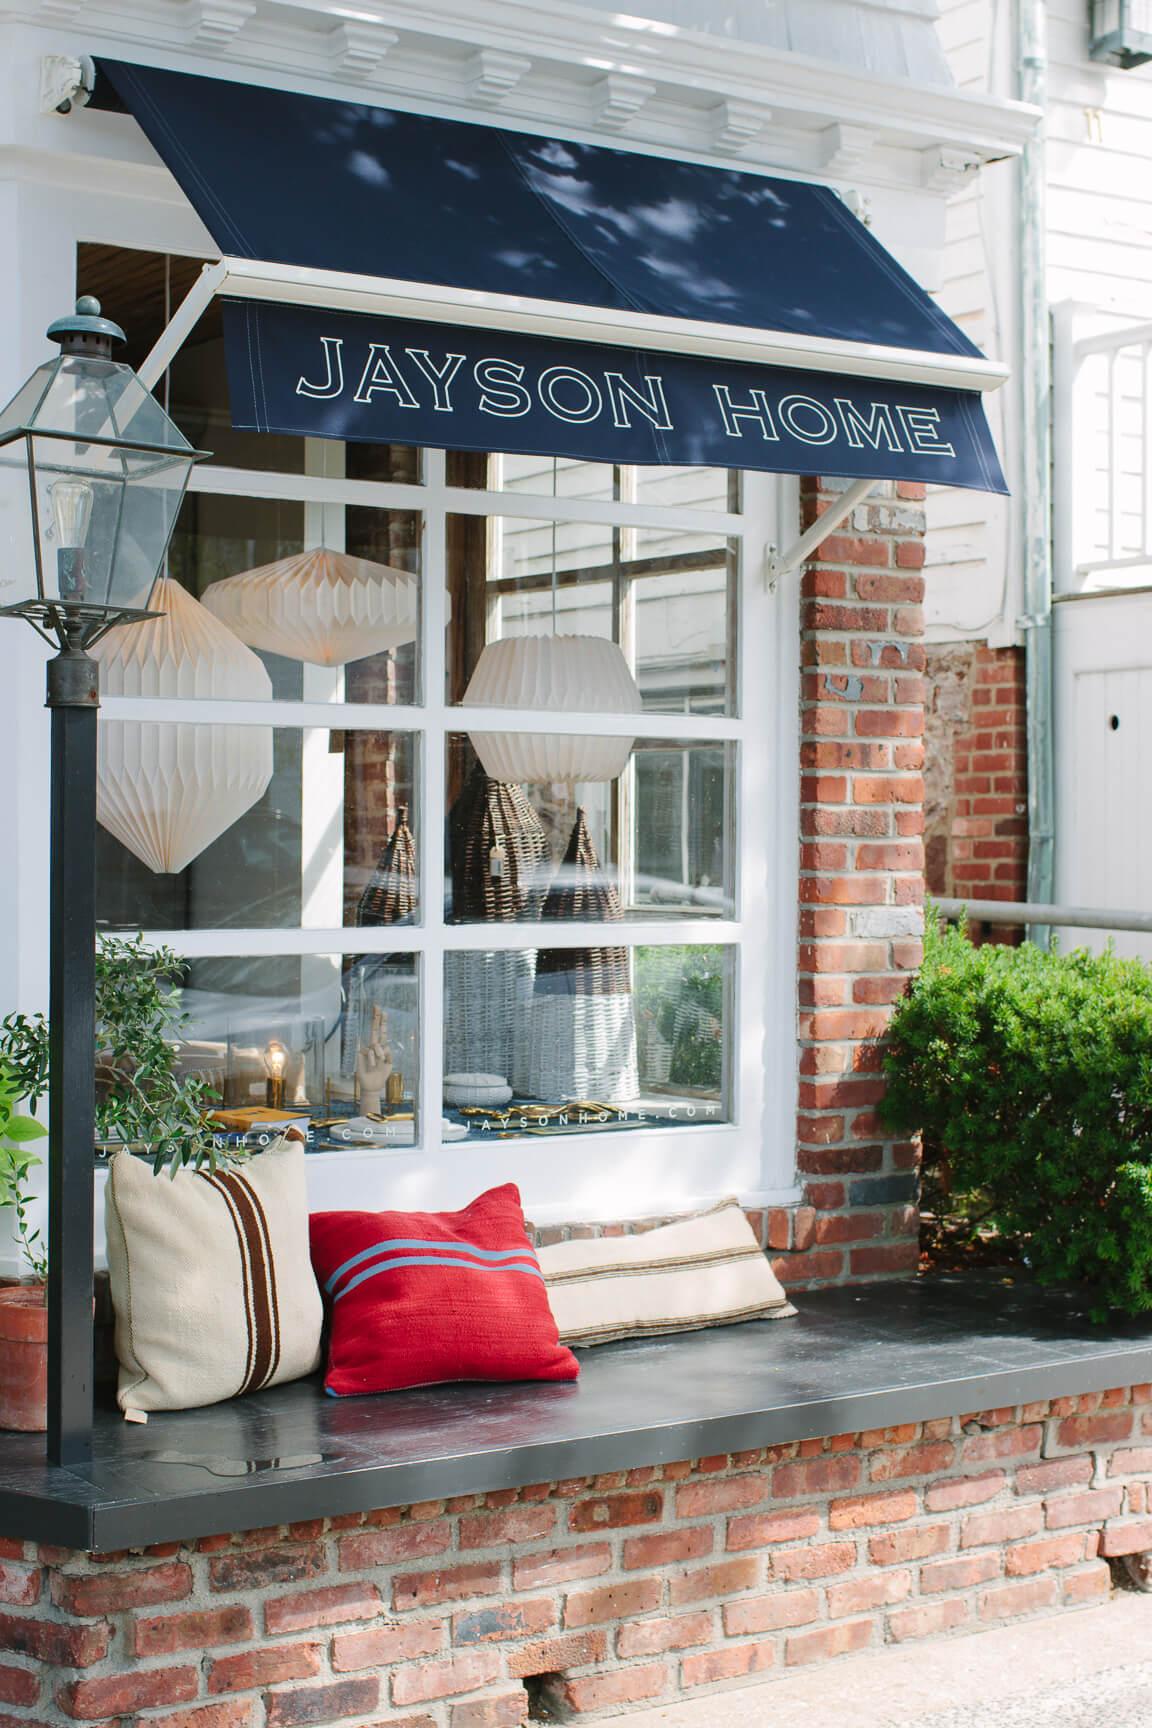 Sag Harbor Jayson Home Pop-Up-4877